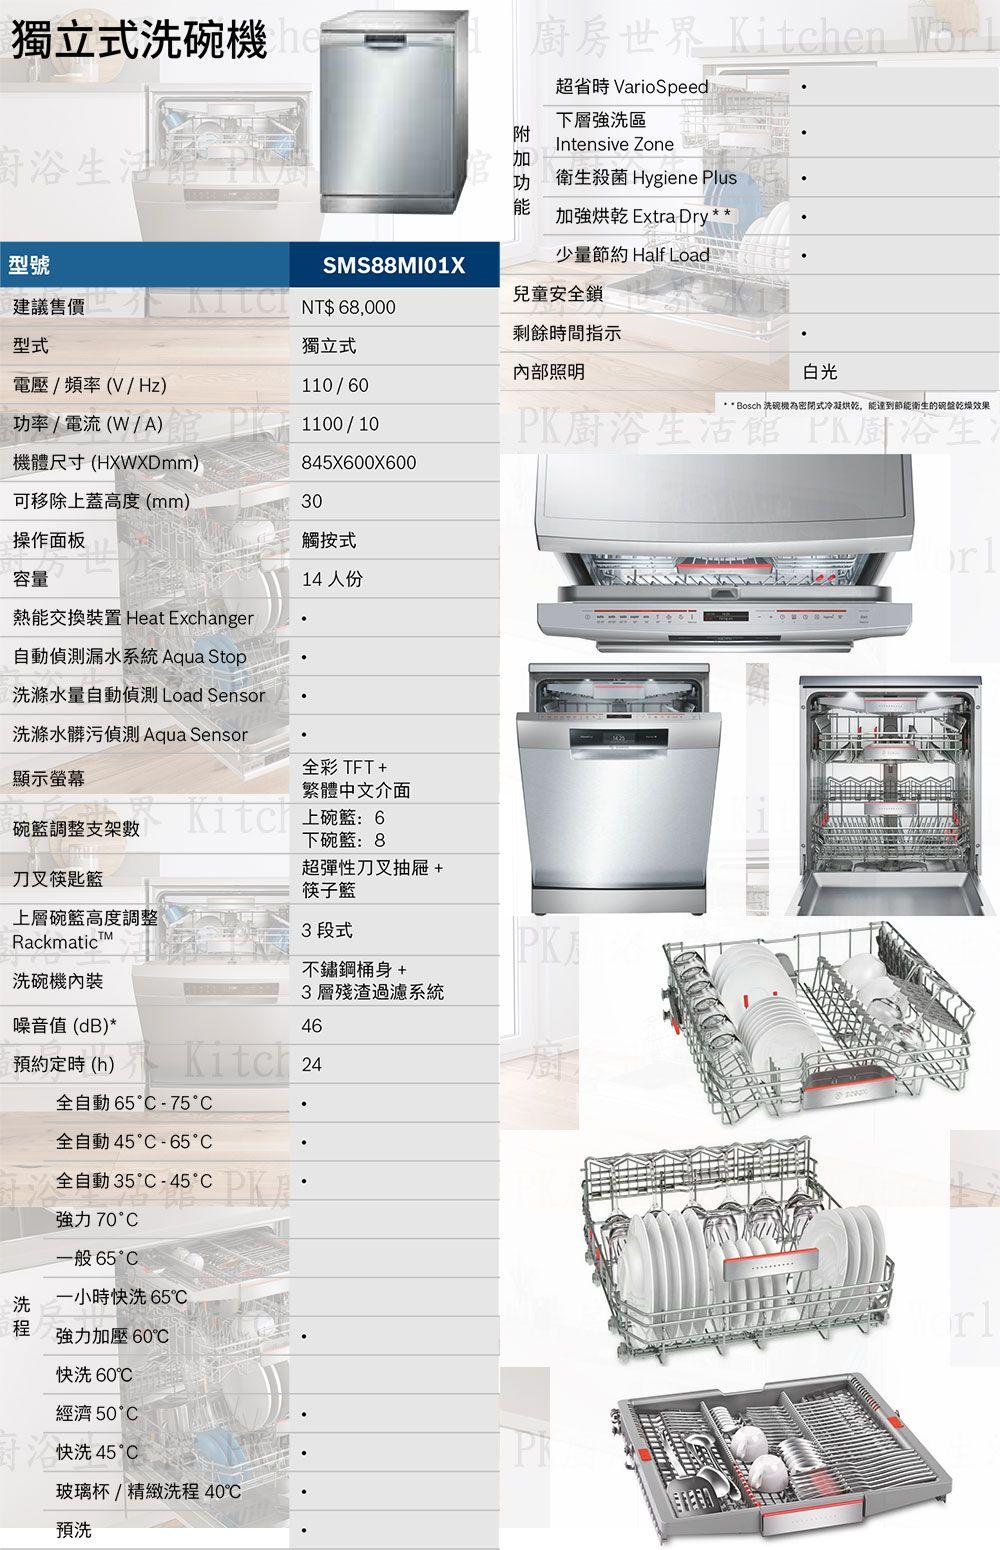 PK/goods/BOSCH/DishWasher/SMS88MI01X-DM-1.jpg